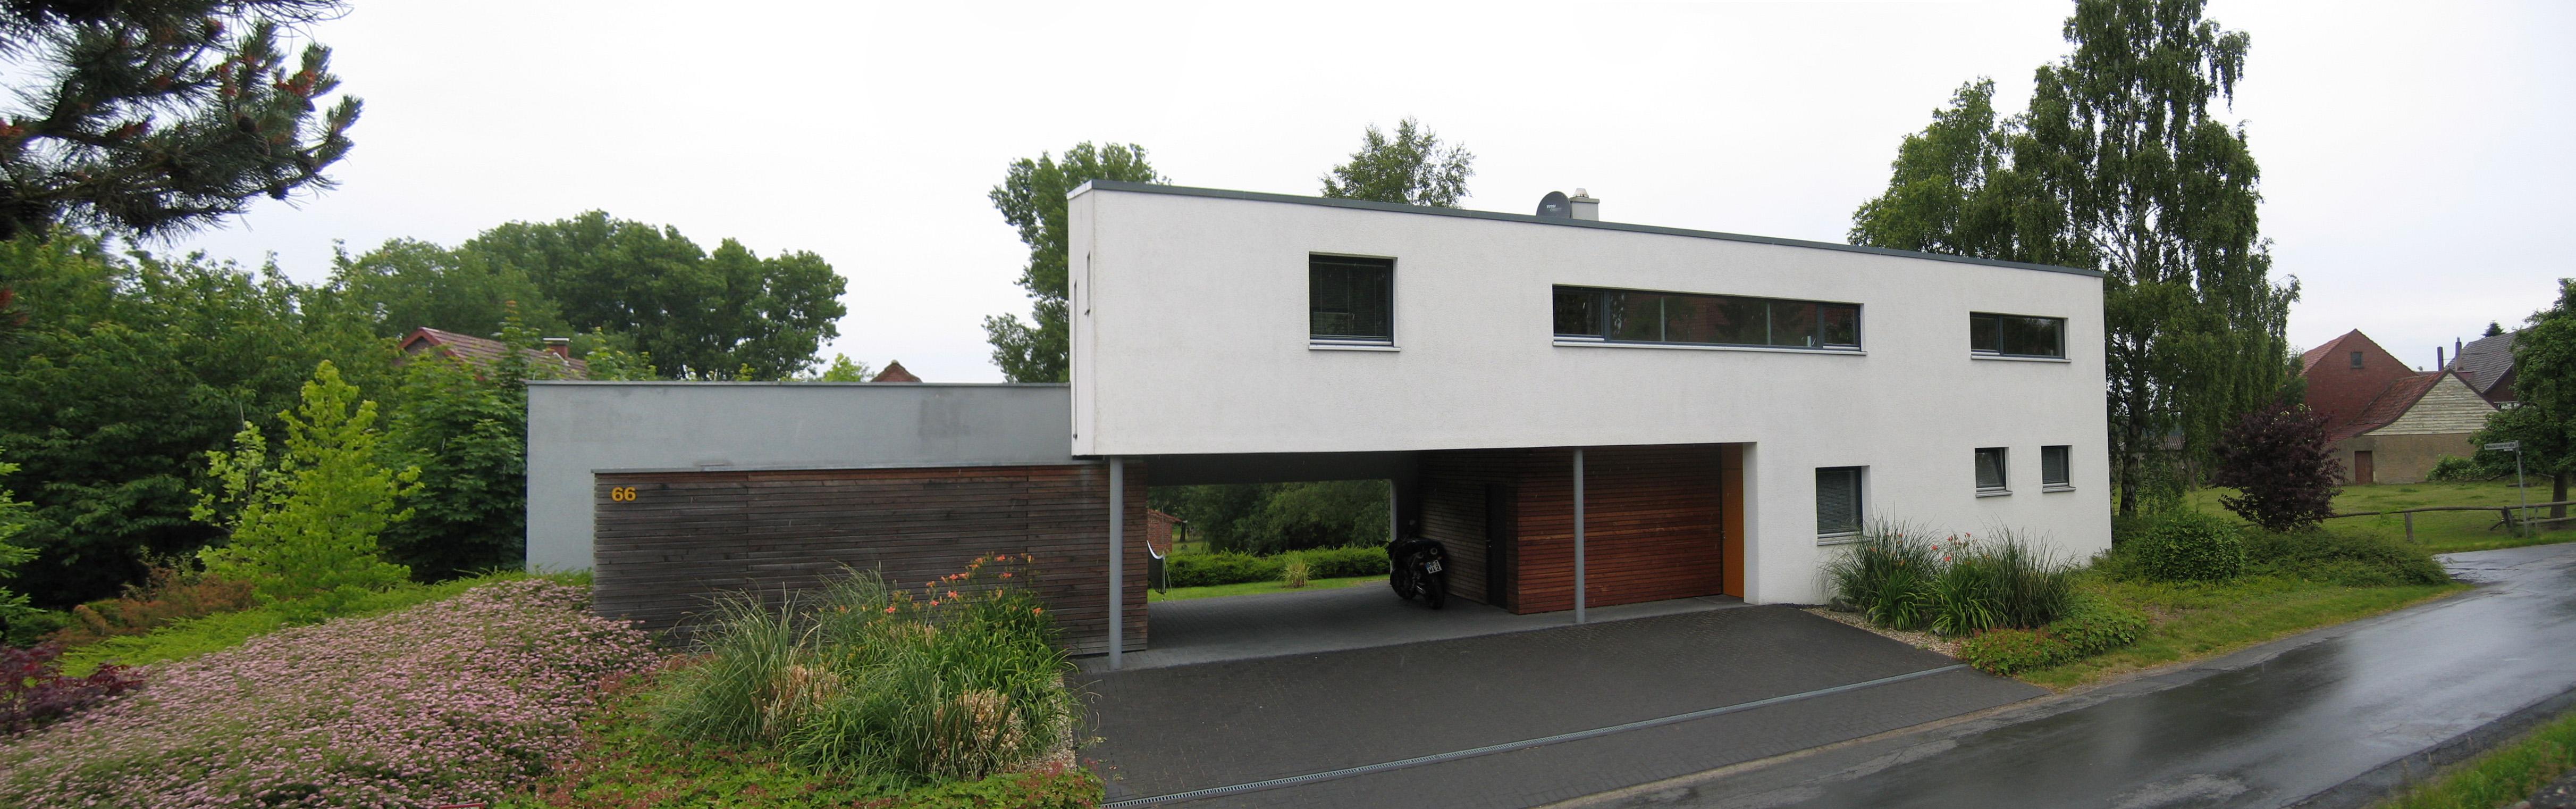 File:Panorama modernes Wohnhaus Kilver.jpg - Wikimedia ommons size: 4846 x 1521 post ID: 7 File size: 0 B